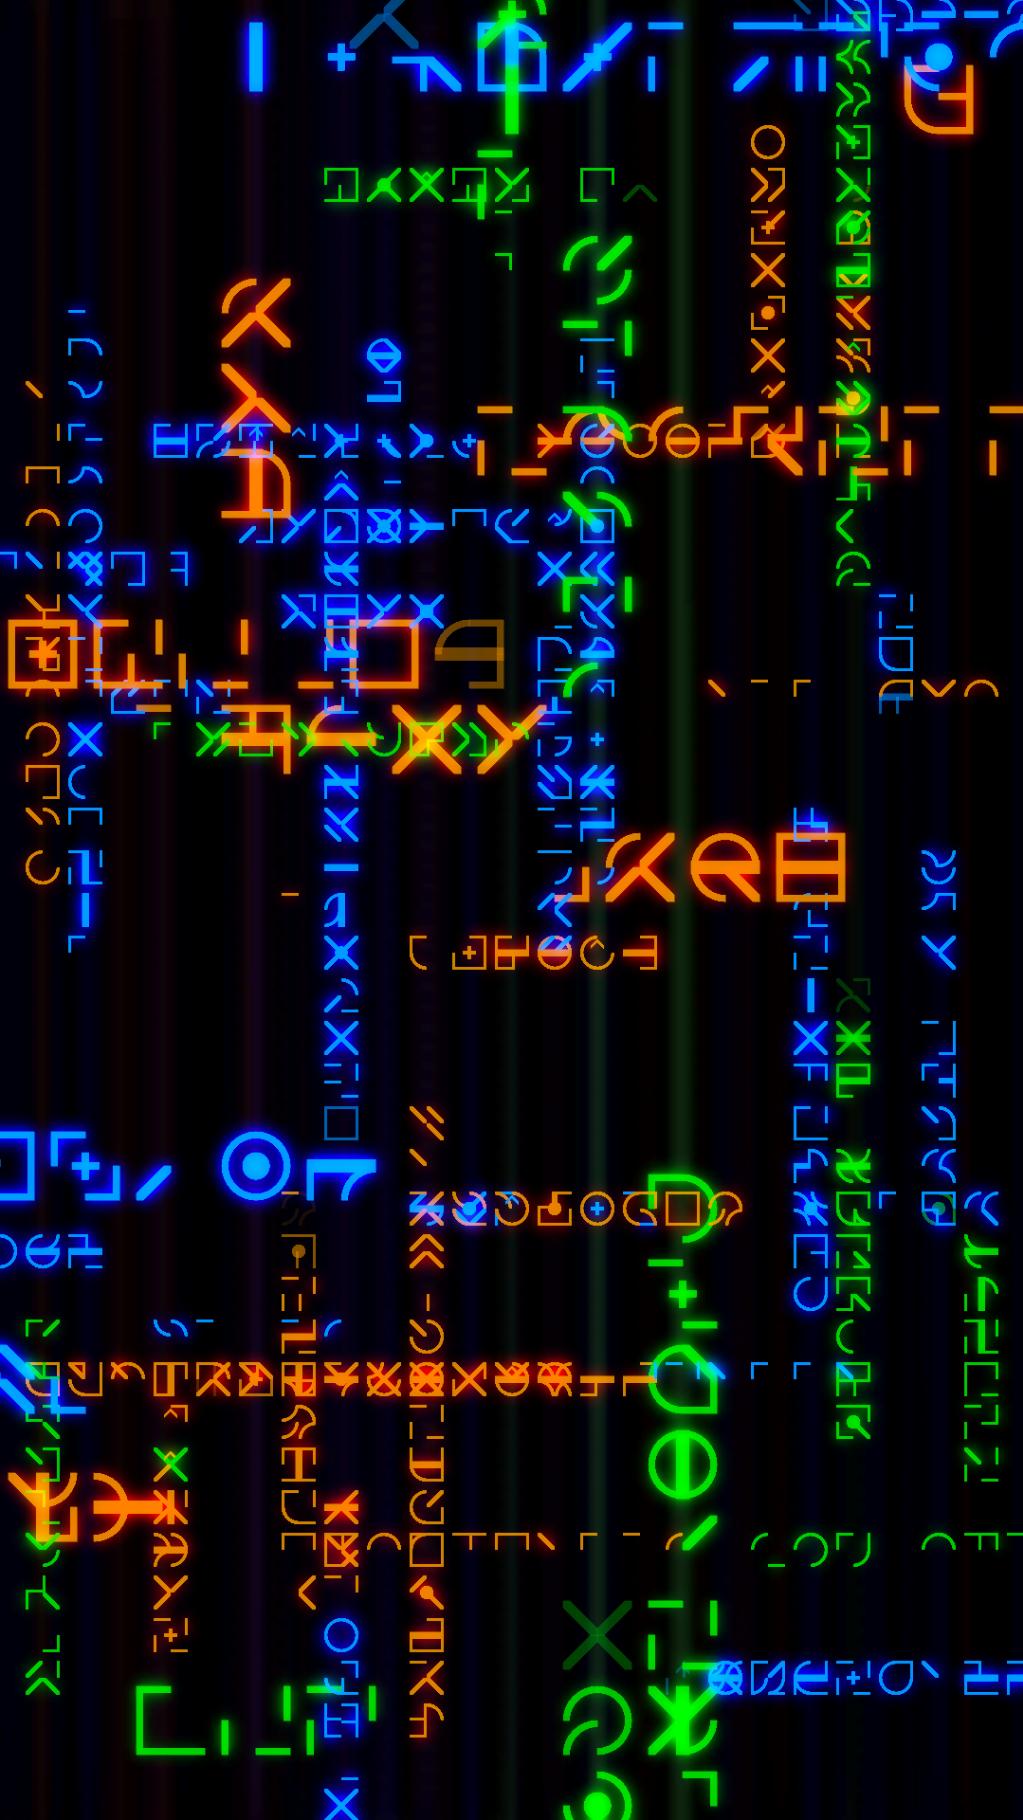 autolingua 37 , 2017 generative animation with stereo sound (three) 20 minutes edition of three